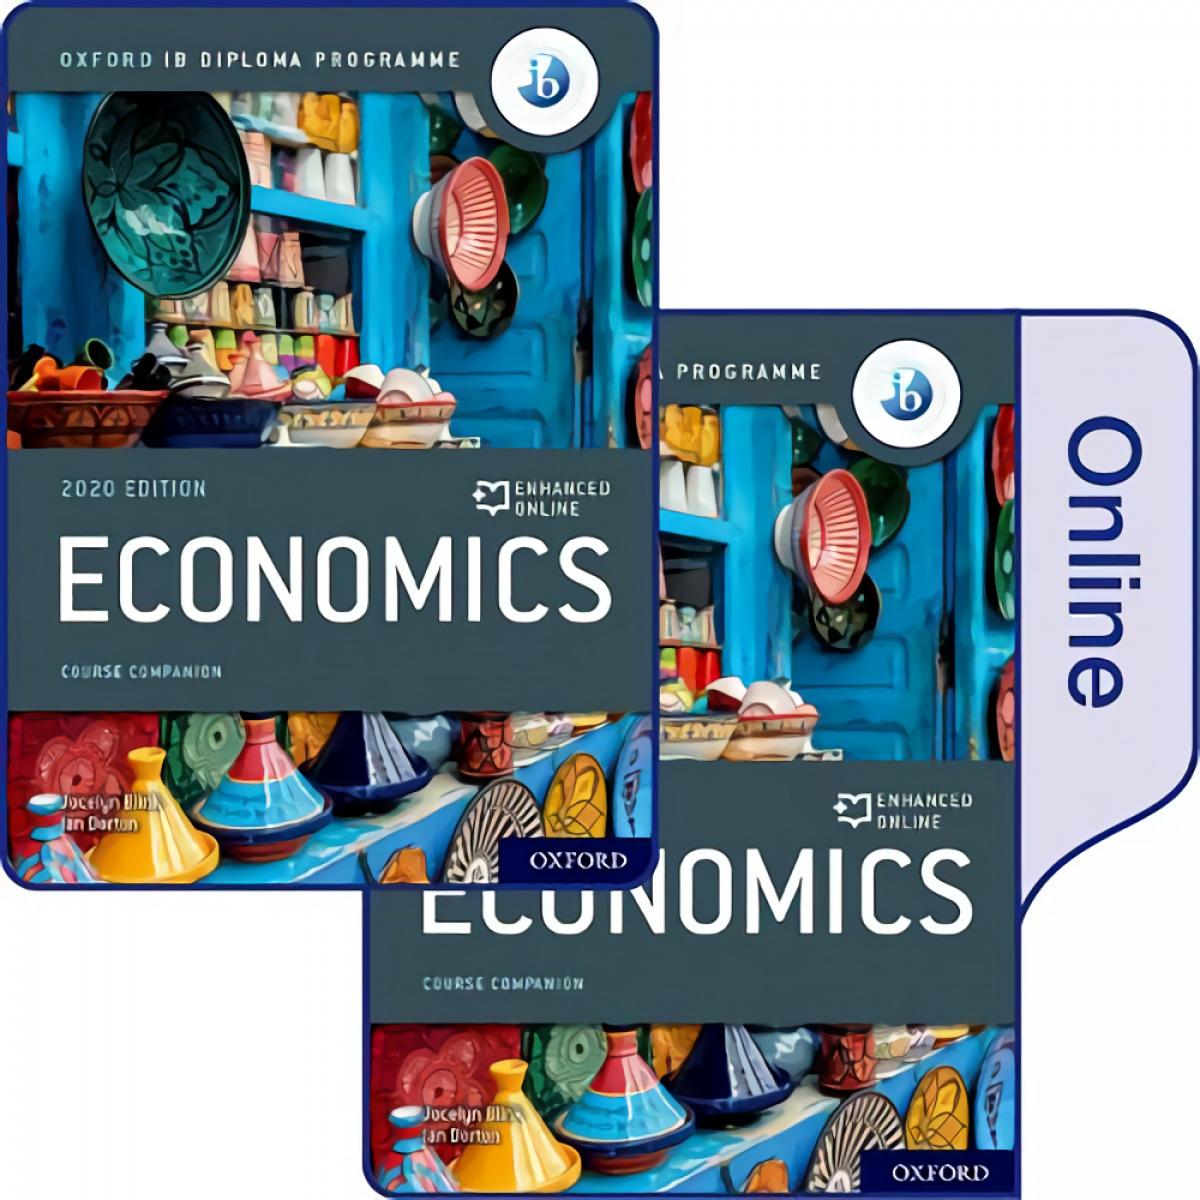 IB ECONOMICS PRINT AND ENHANCED ONLINE COURSE PACK